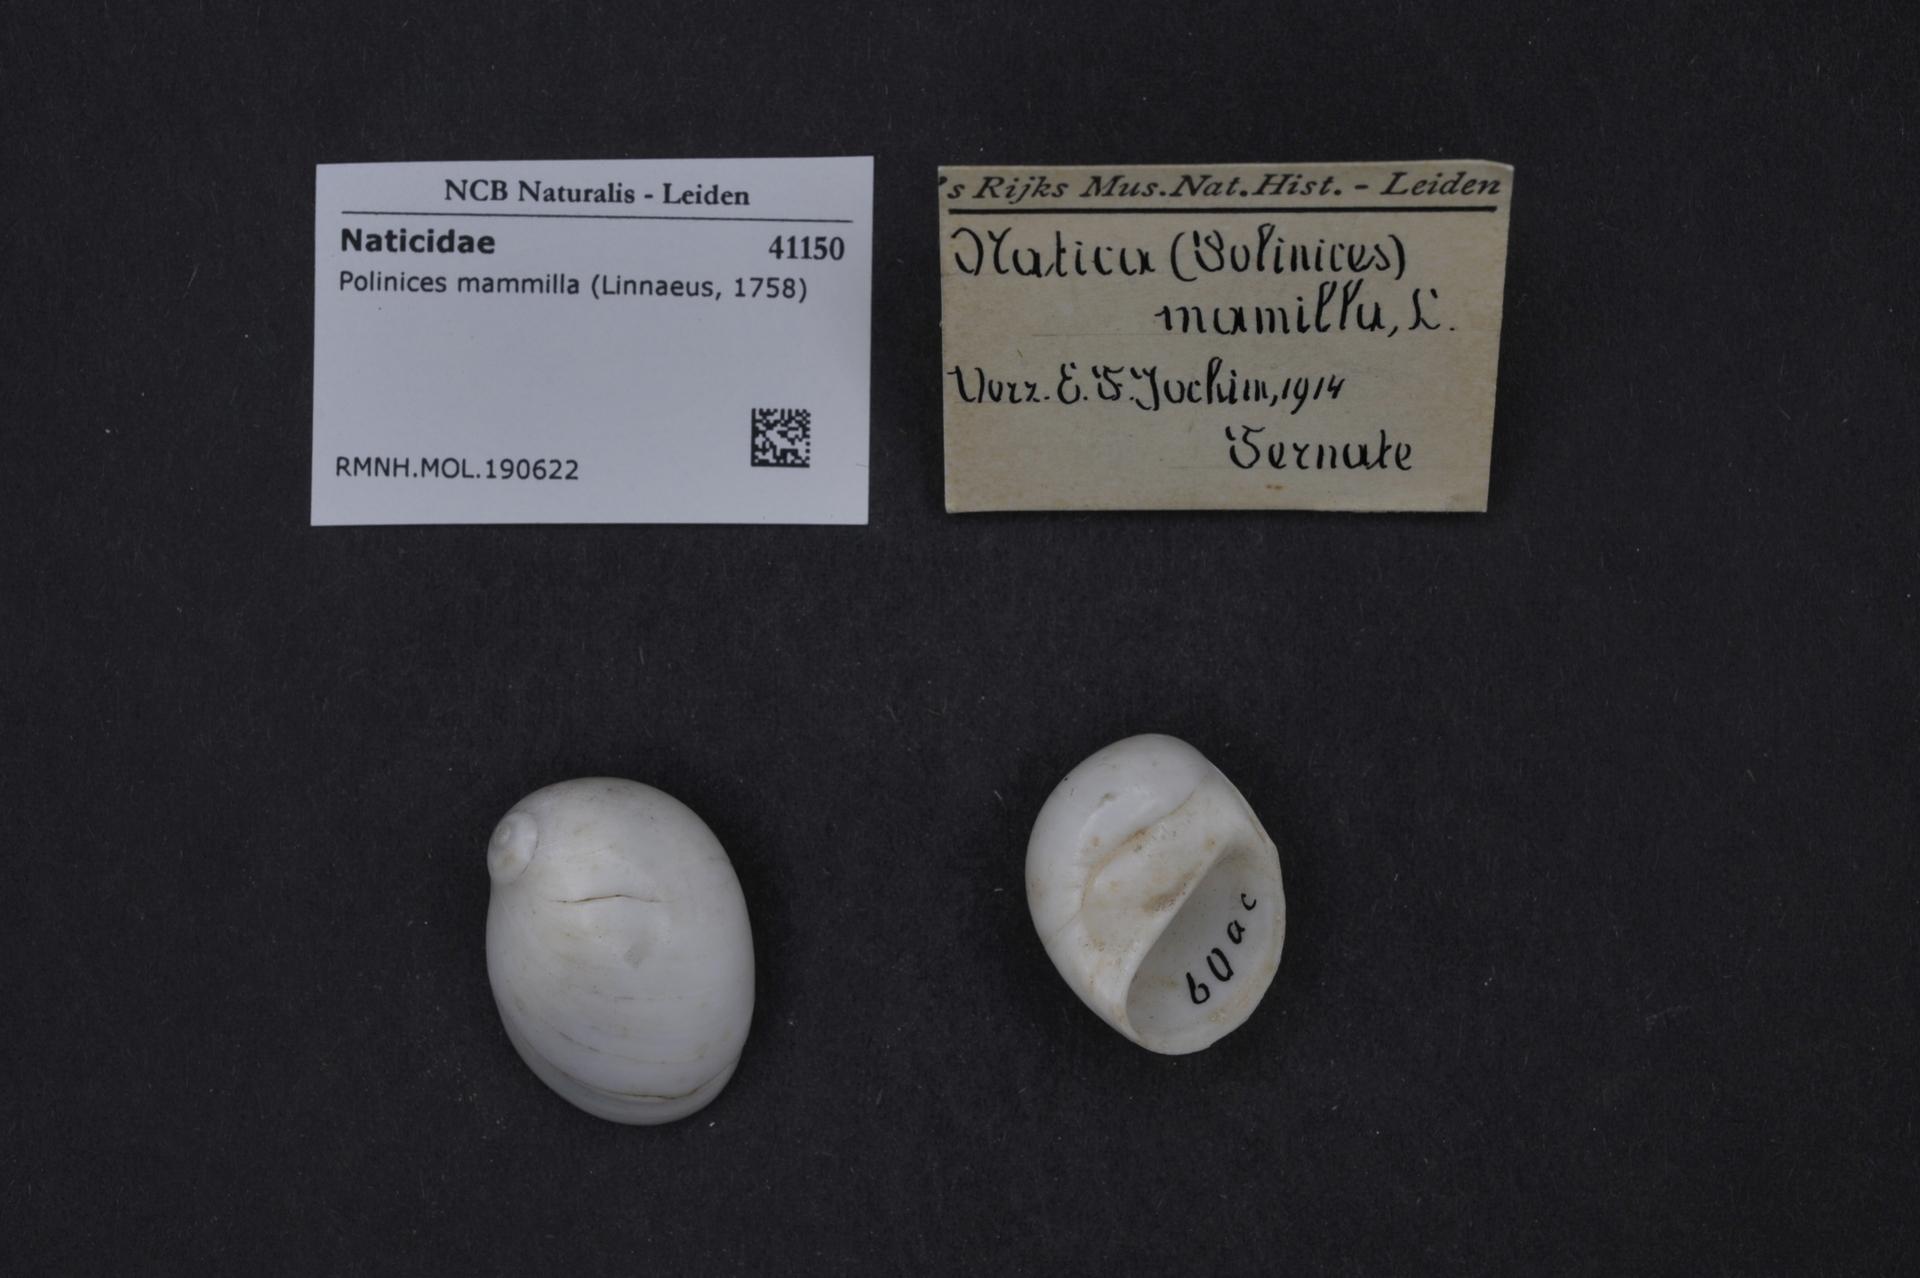 RMNH.MOL.190622 | Polinices mammilla (Linnaeus, 1758)